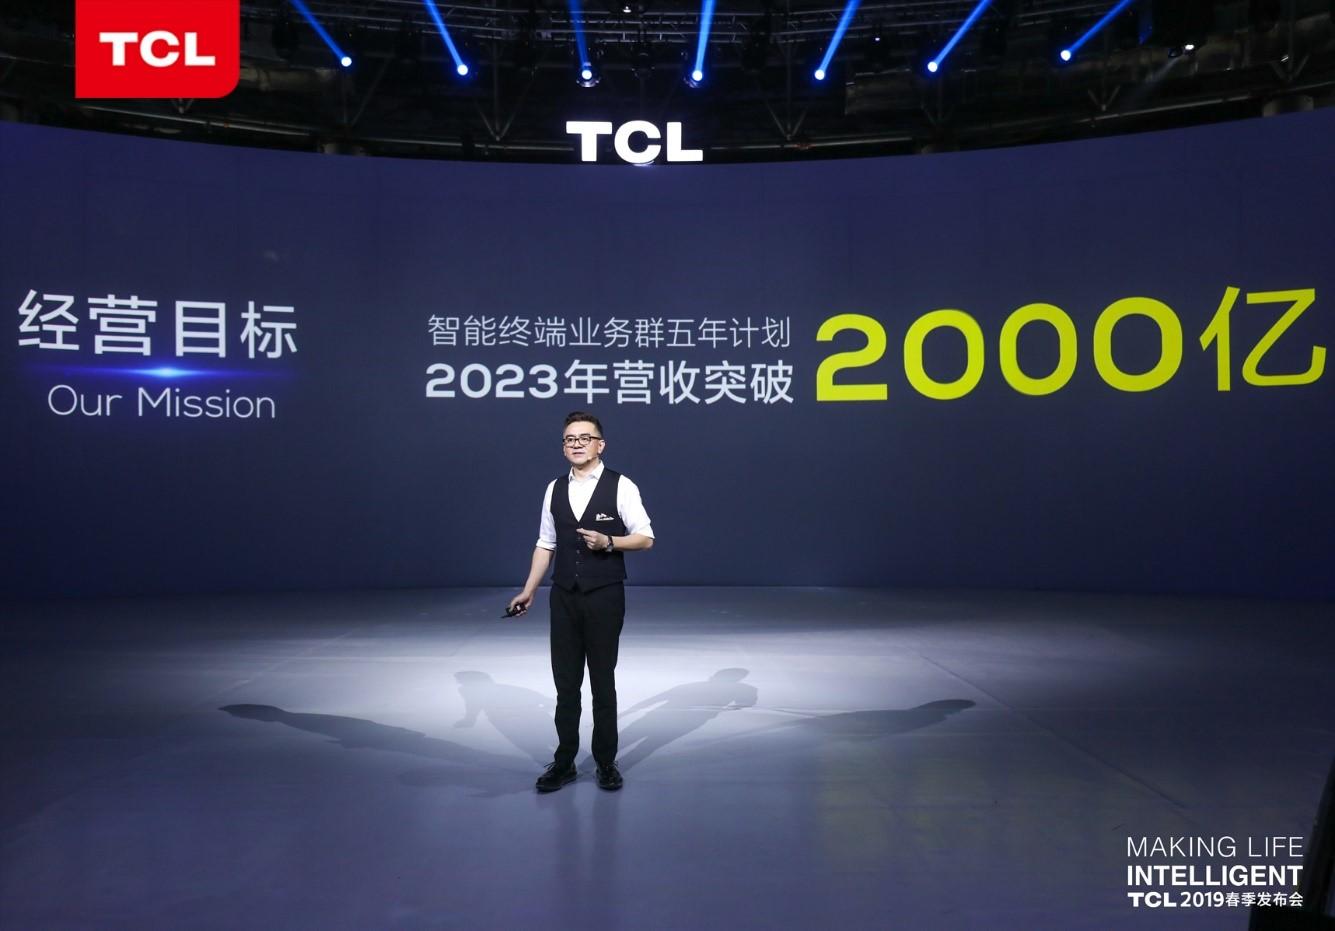 TCL加入AIoT混战 五年内营收要破2000亿